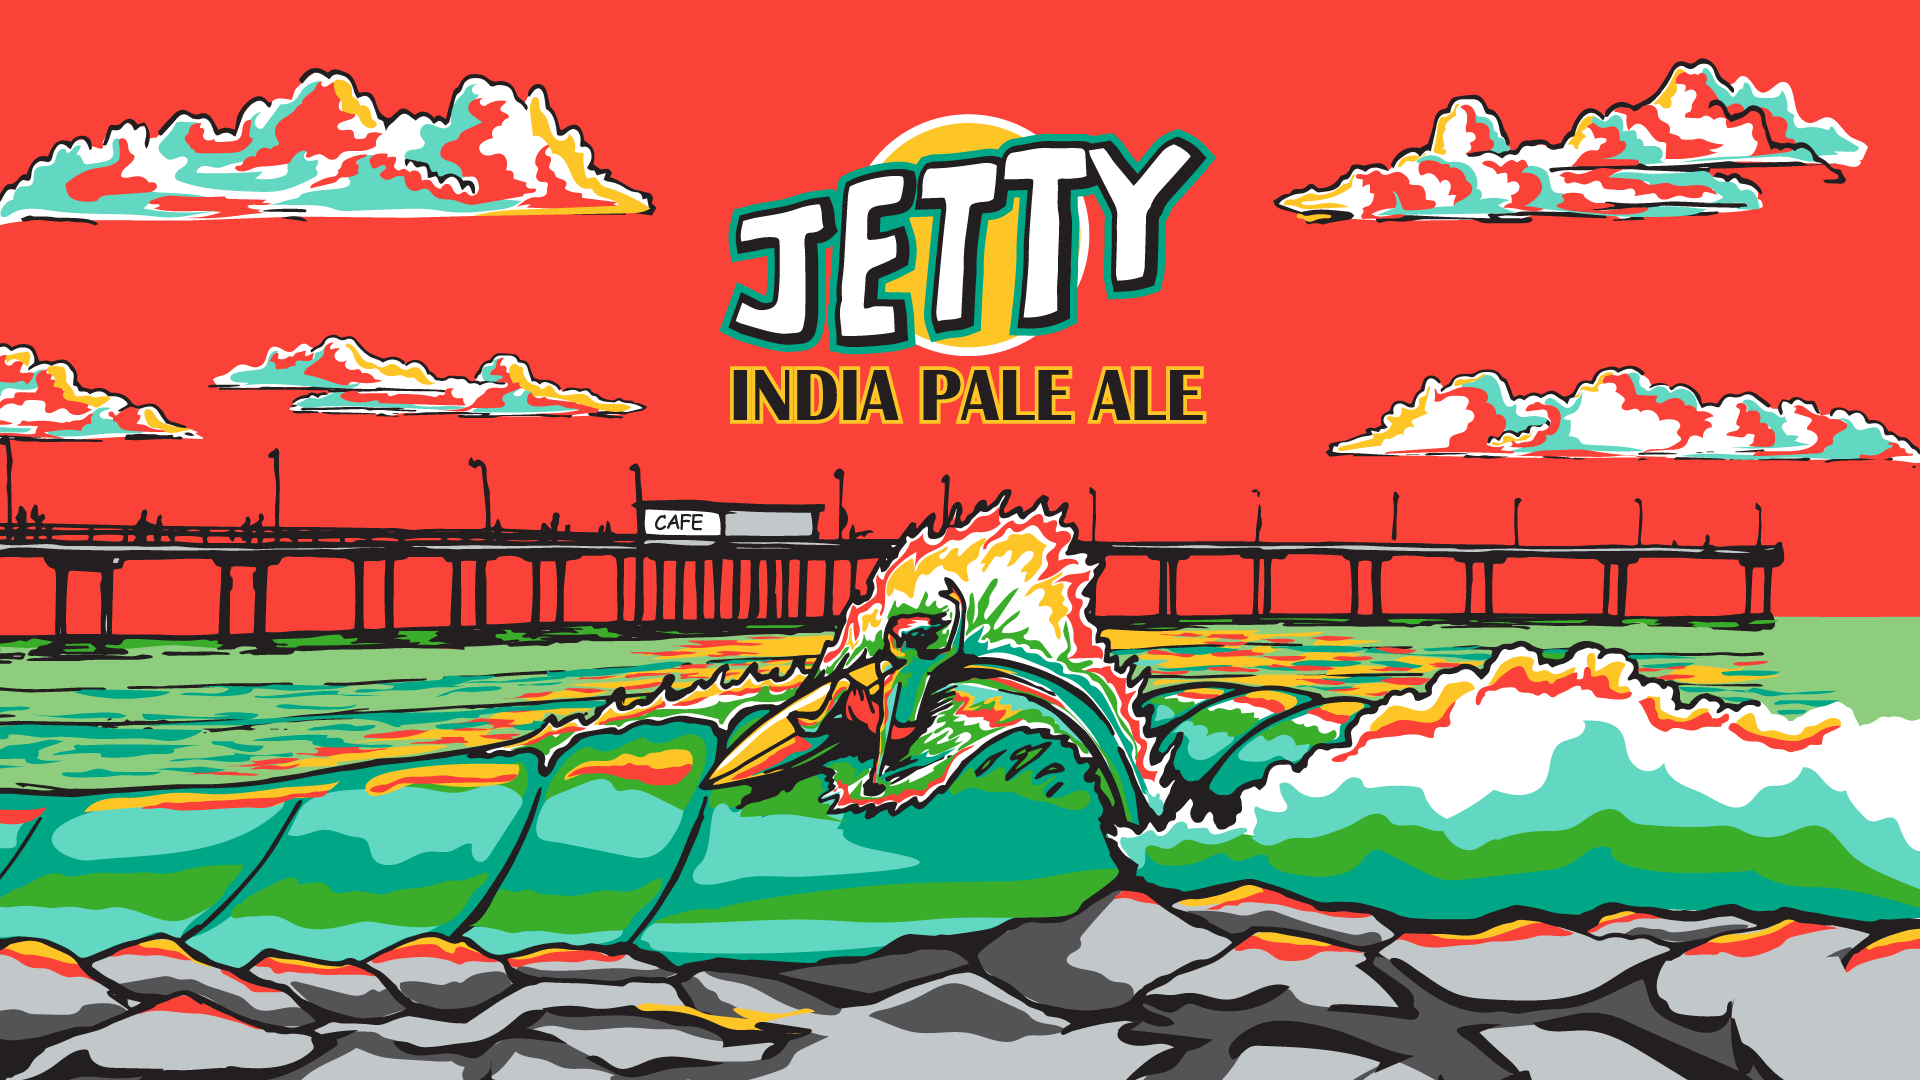 Jetty Tasting